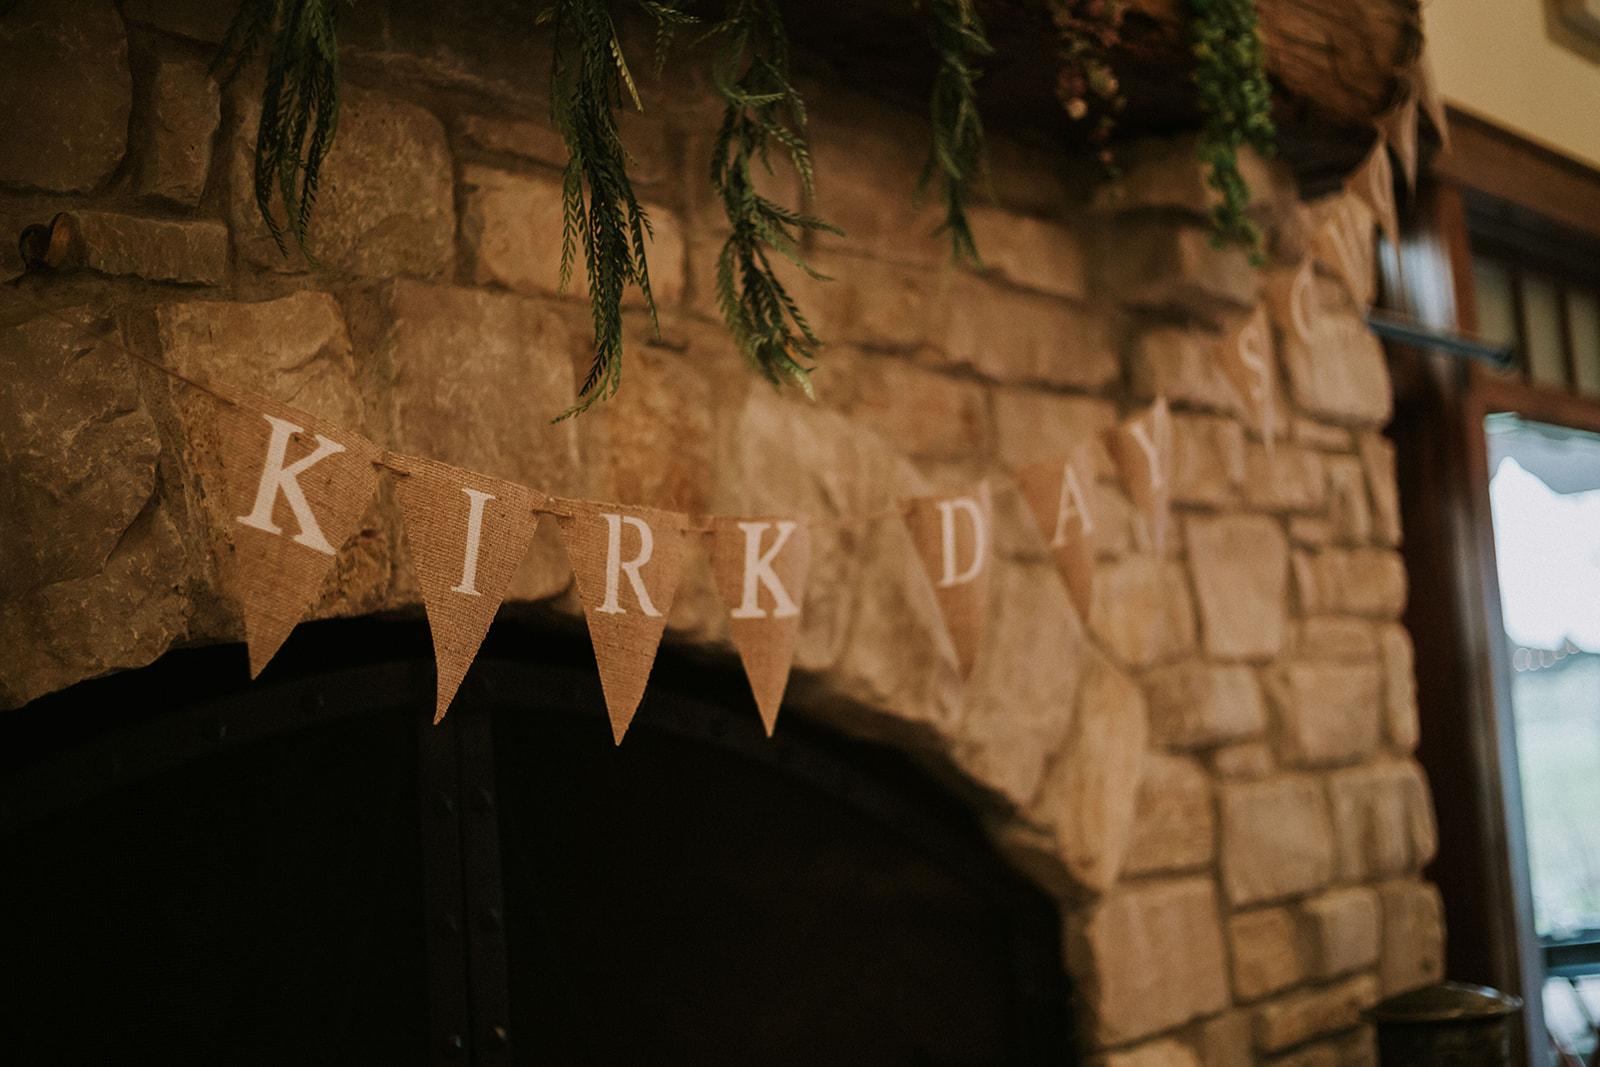 kirkday-61.jpg